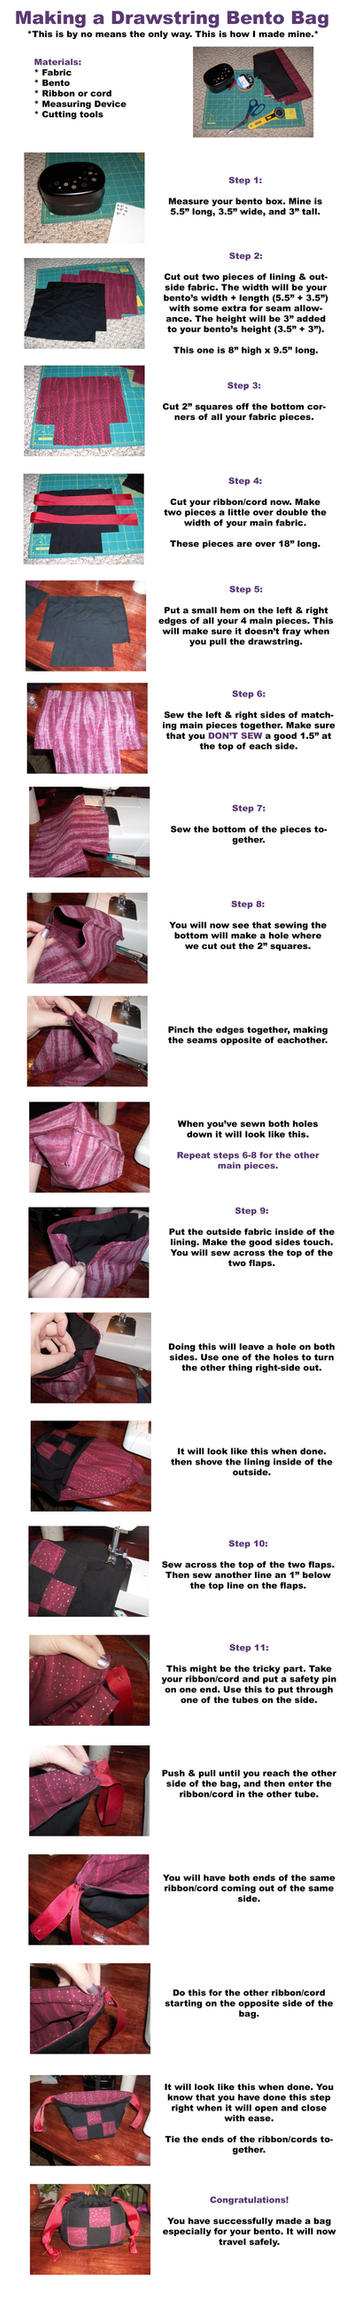 Drawstring Bento Bag by Geisha-Neko